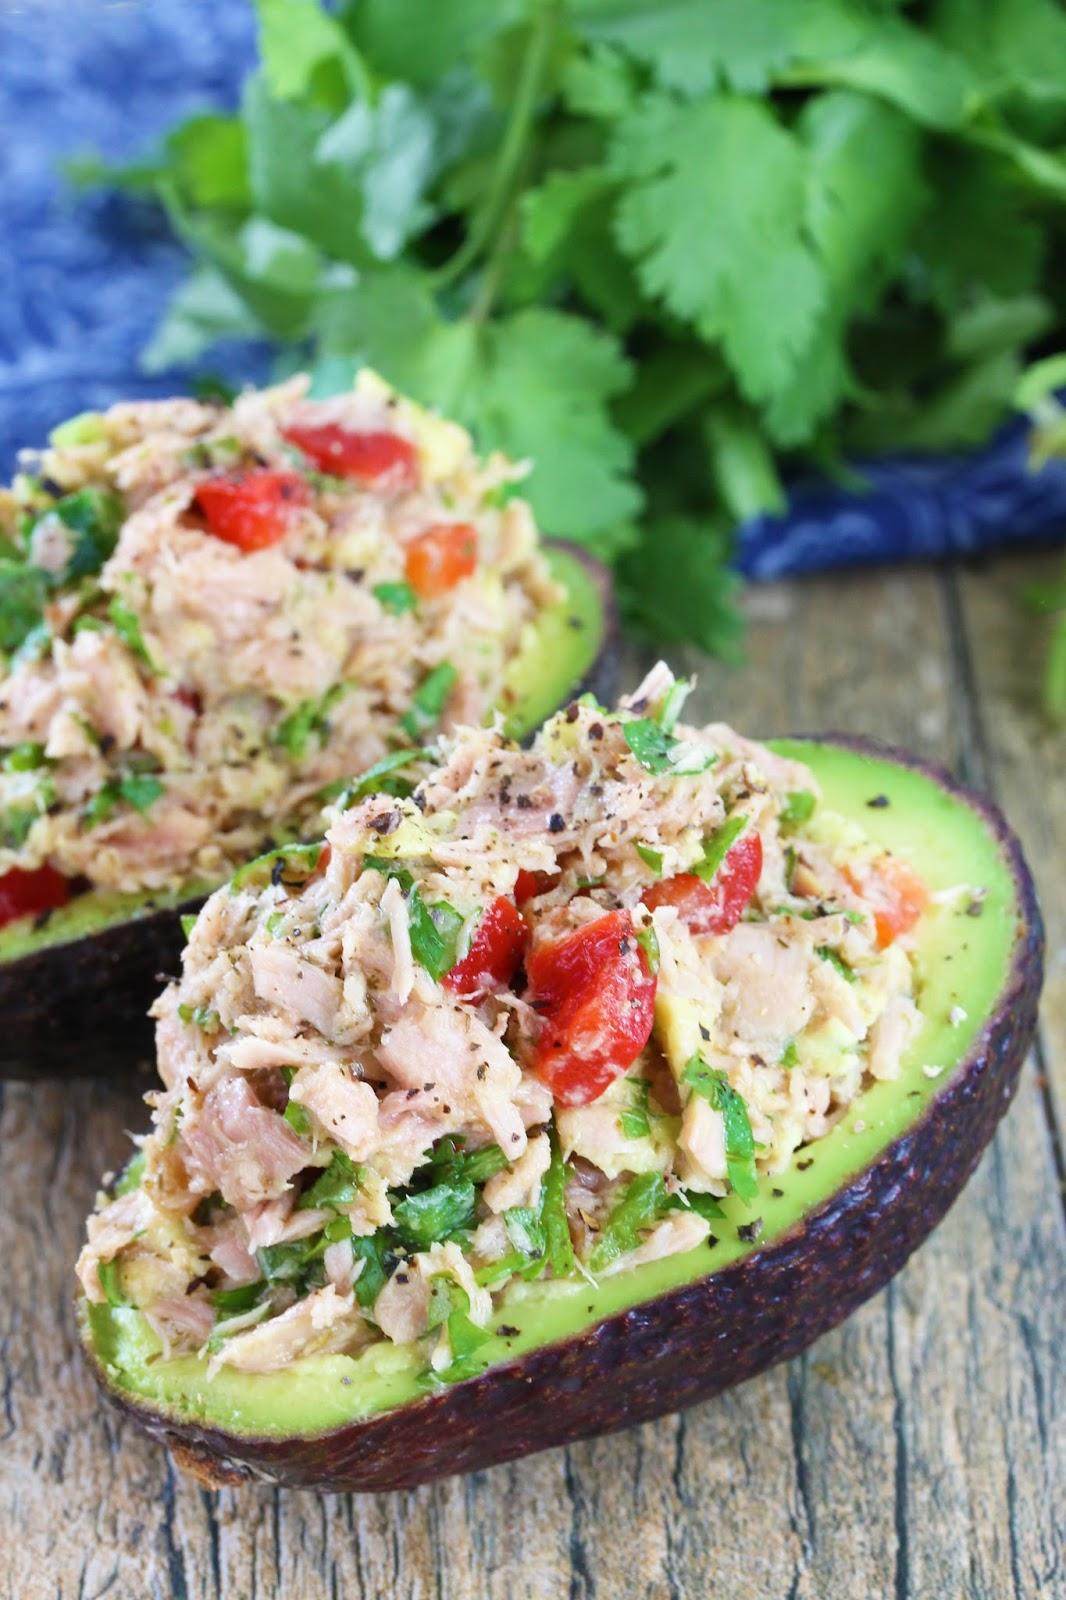 Avocado Stuffed With Tuna Salad by Stayathomechef